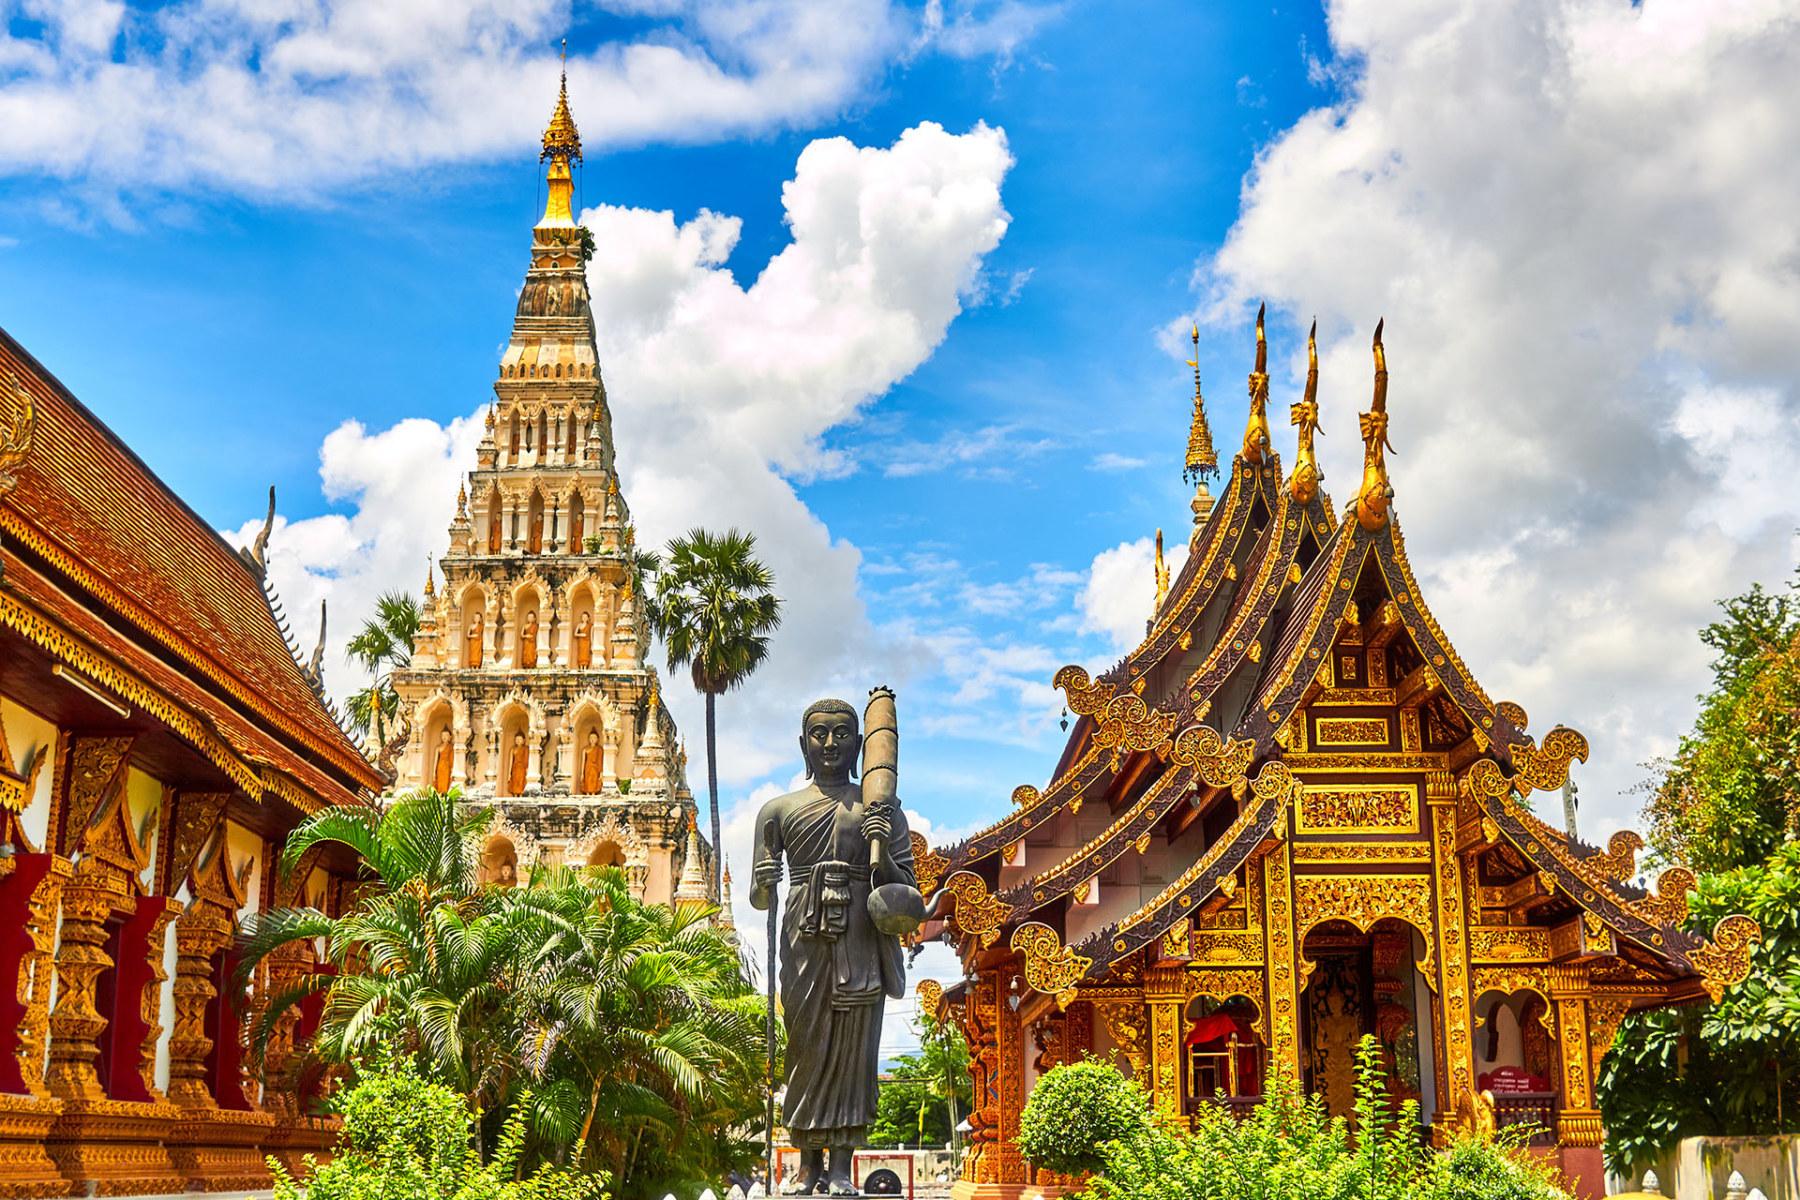 thailand wat kum kam photograph